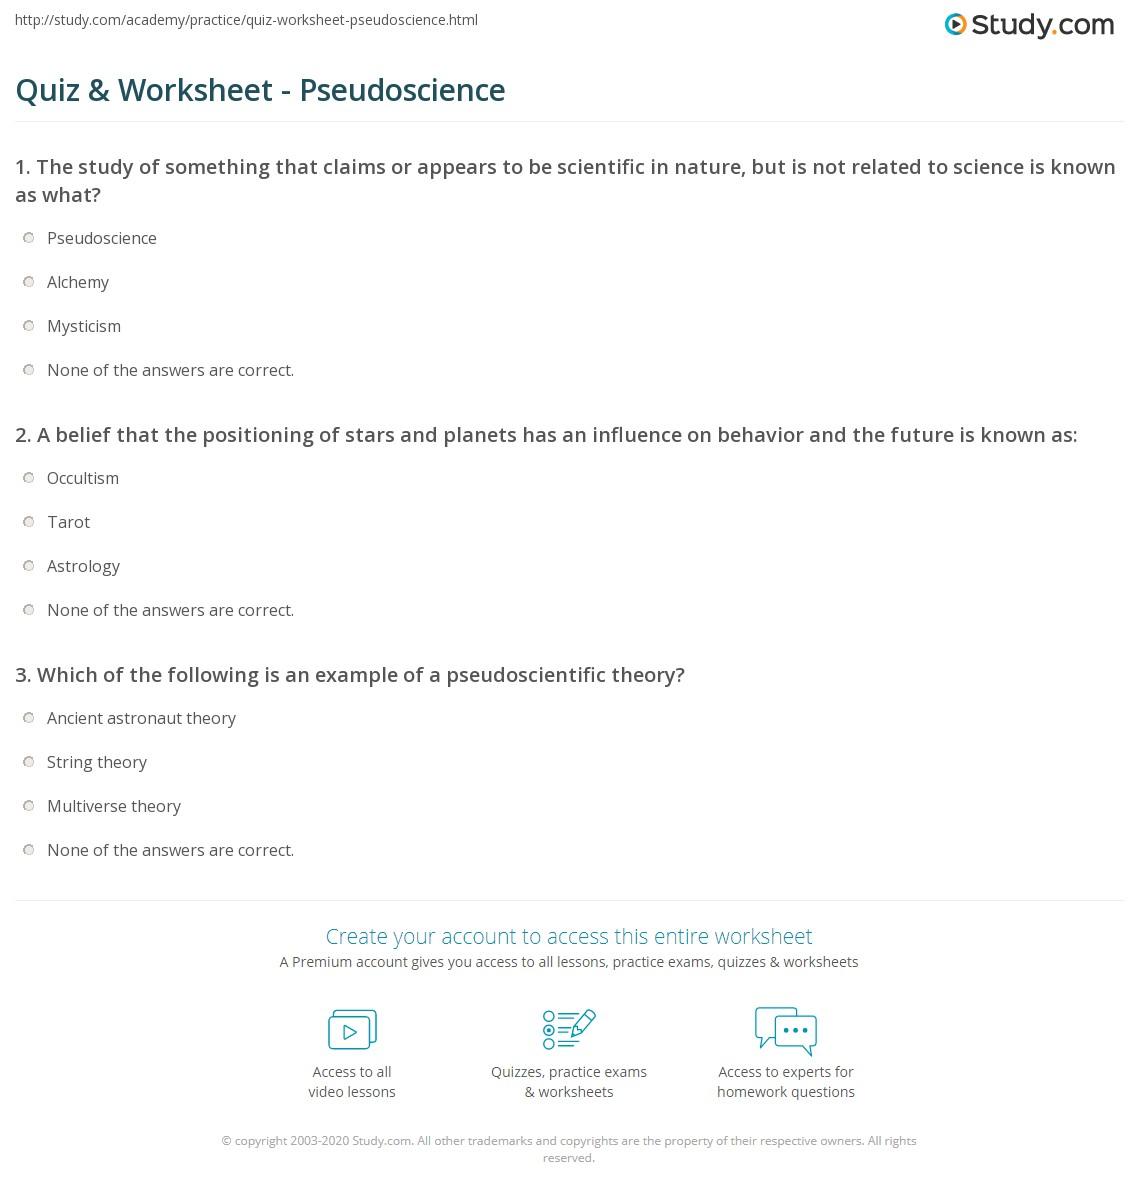 Quiz & Worksheet - Pseudoscience | Study.com